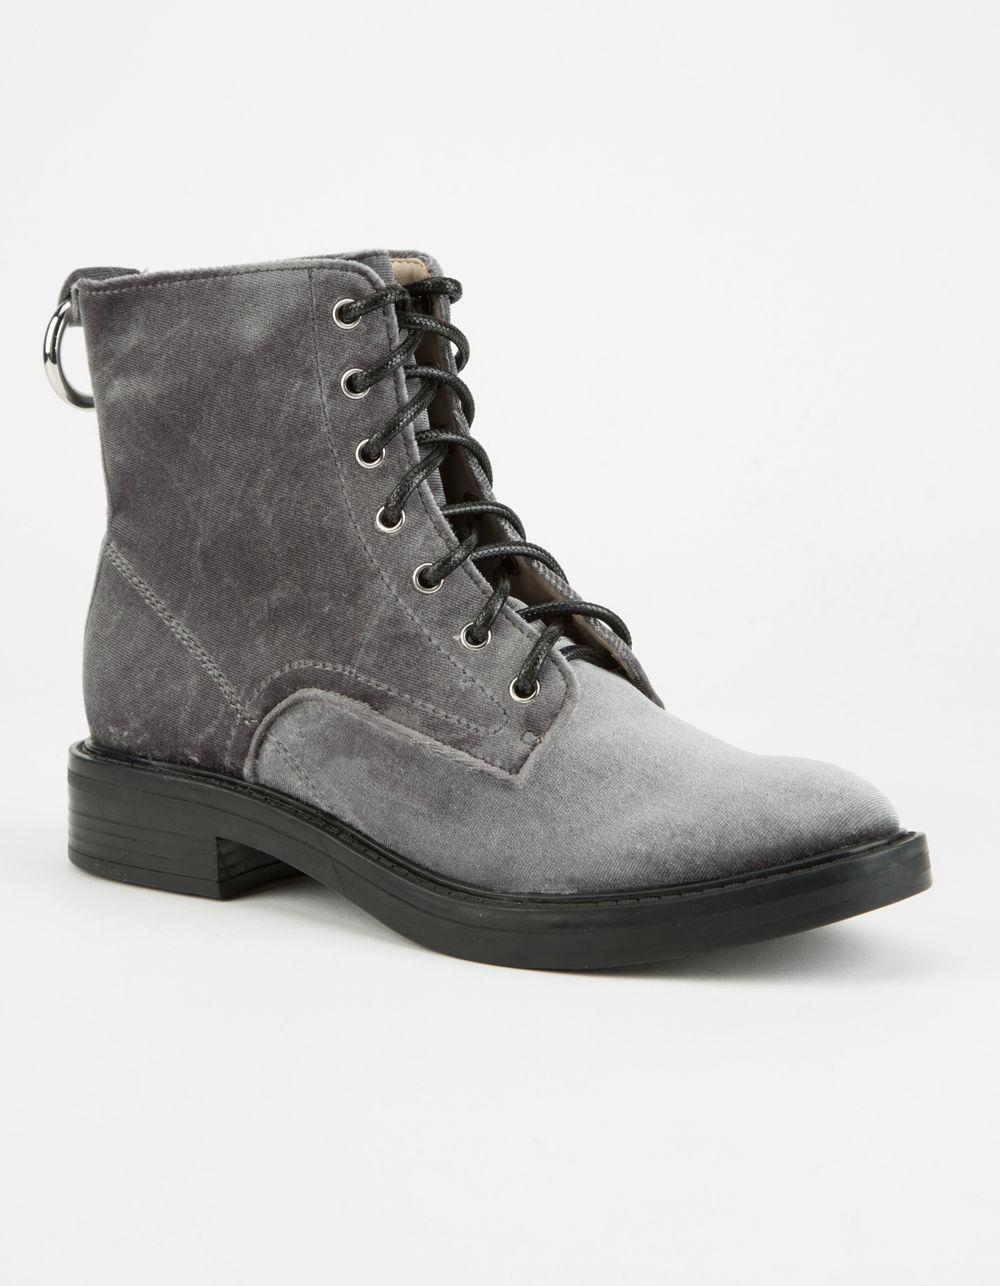 Dolce Vita Bardot Lace-Up Ankle Boot (Women's) FGbhohvuUt